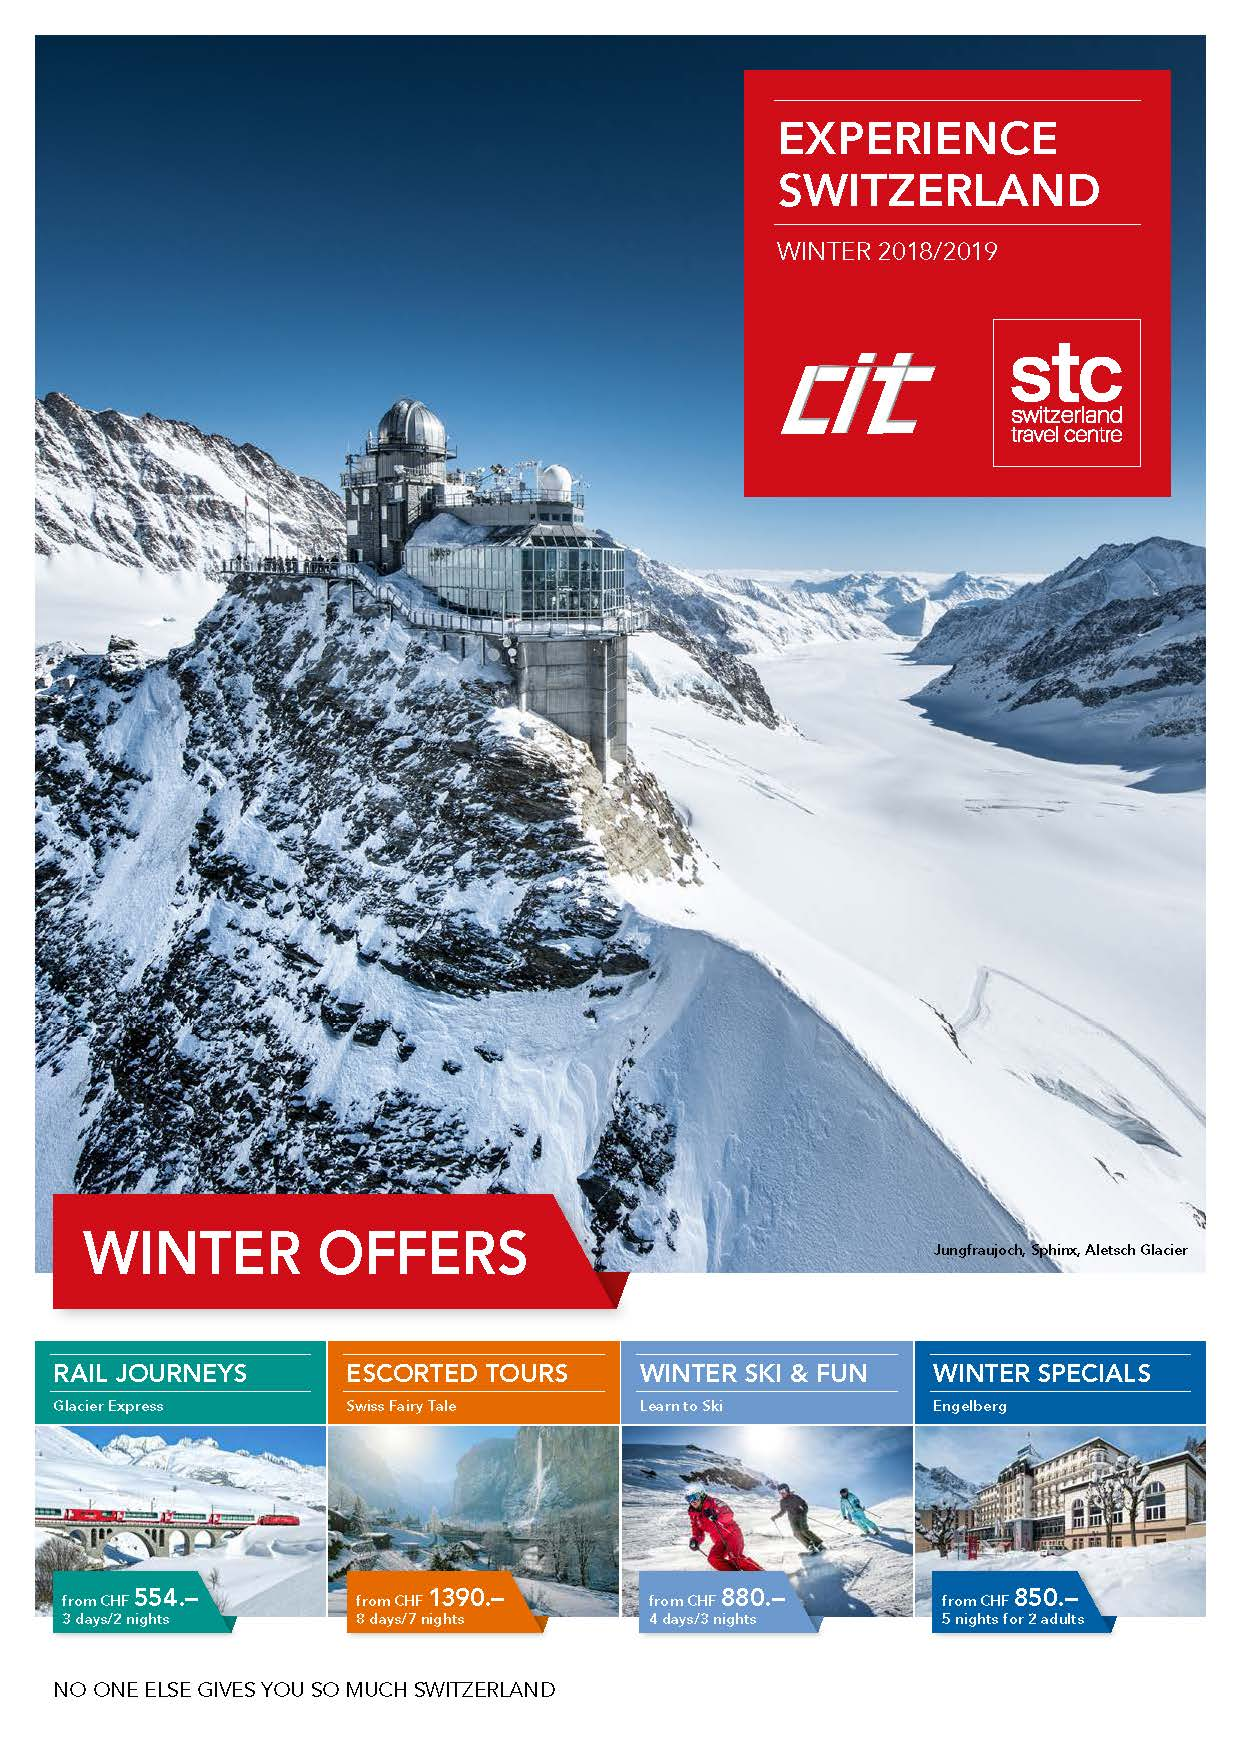 Travel to Switzerland Winter Brochure 2019